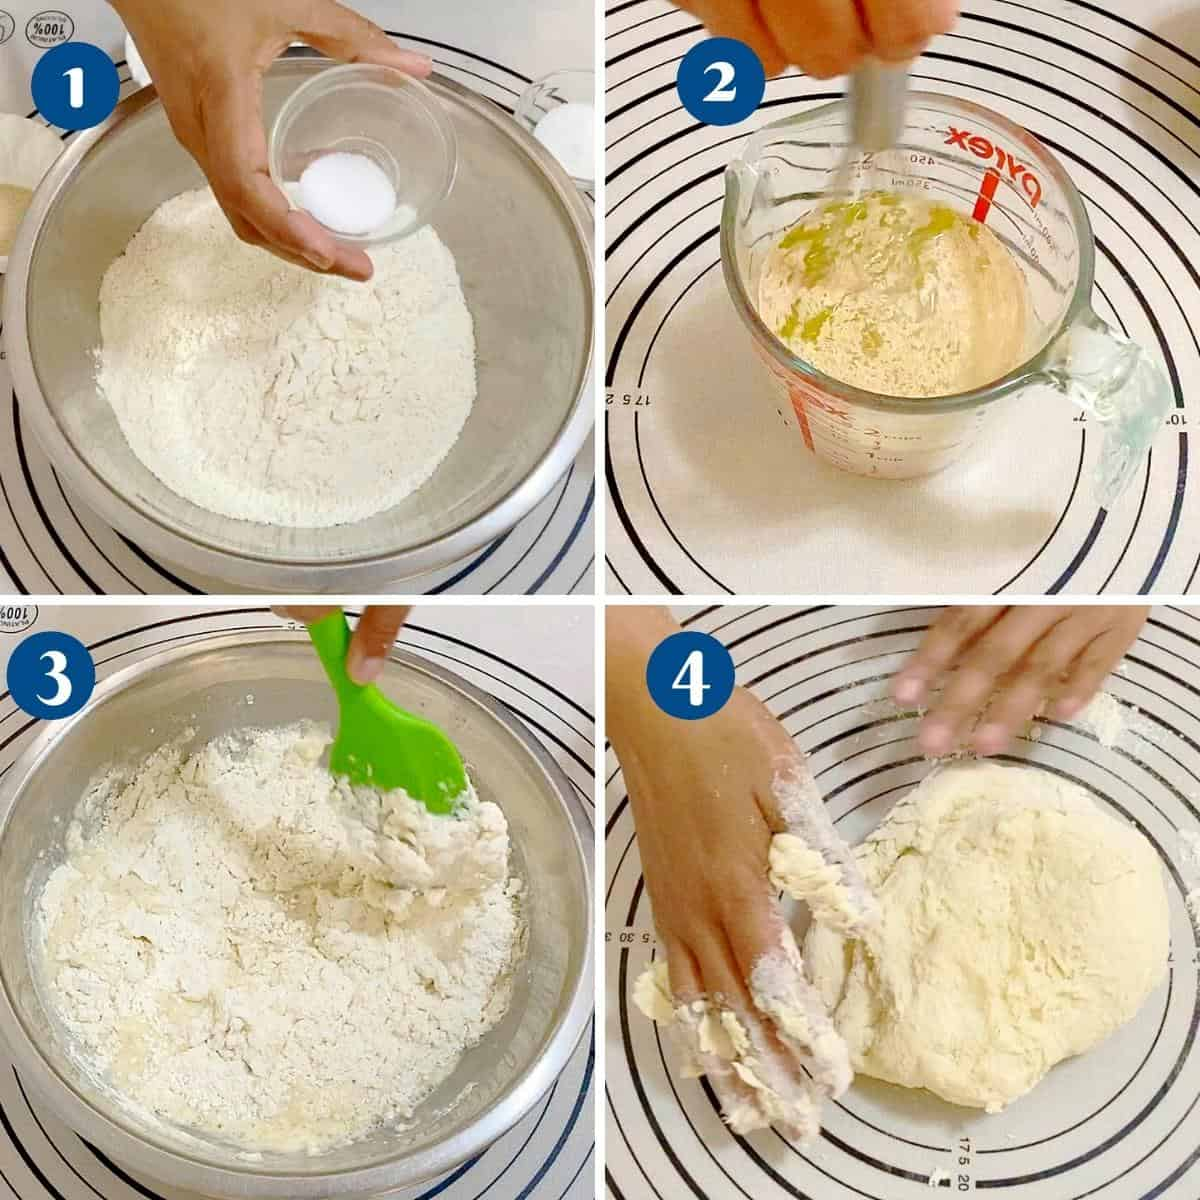 Progress pictures preparing the pizza dough.